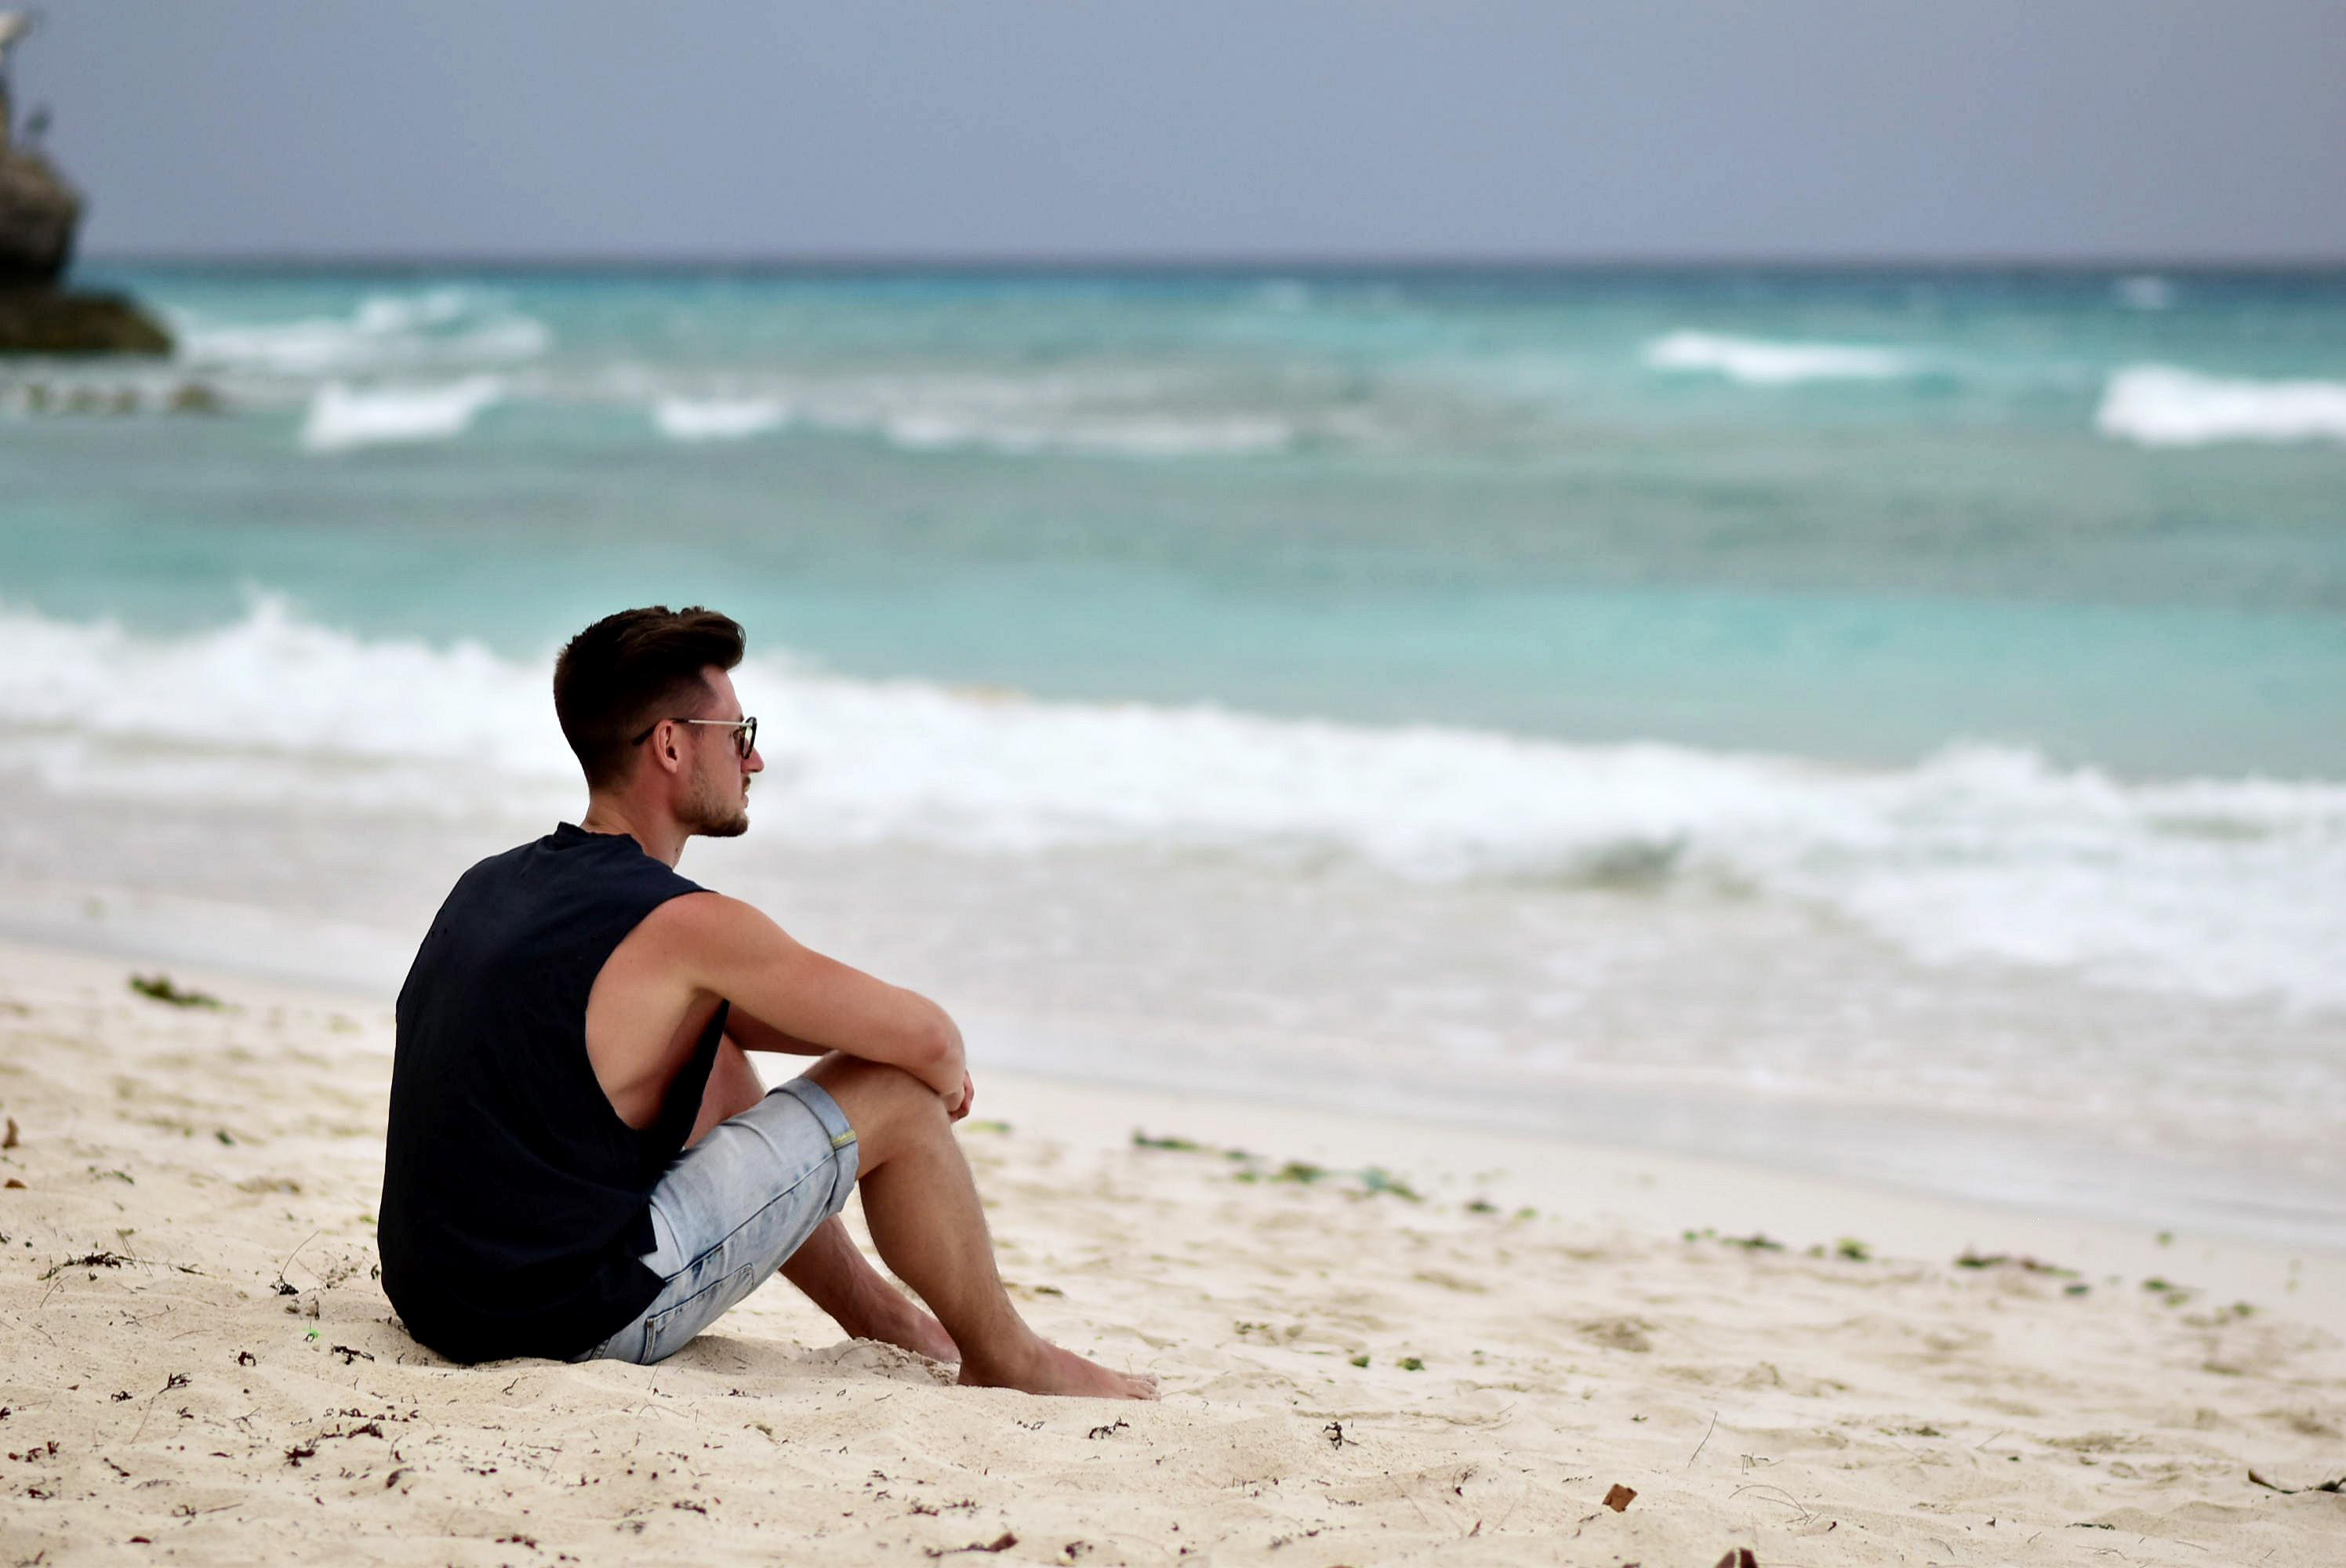 Tommeezjerry-Männerblog-Berlinblog-Fashionblog-Styleblog-Travelblog-Travel-Reiseblog-Reisen-Barbados-Karibik-Carribean-Summer-Sommer-Vacation-6